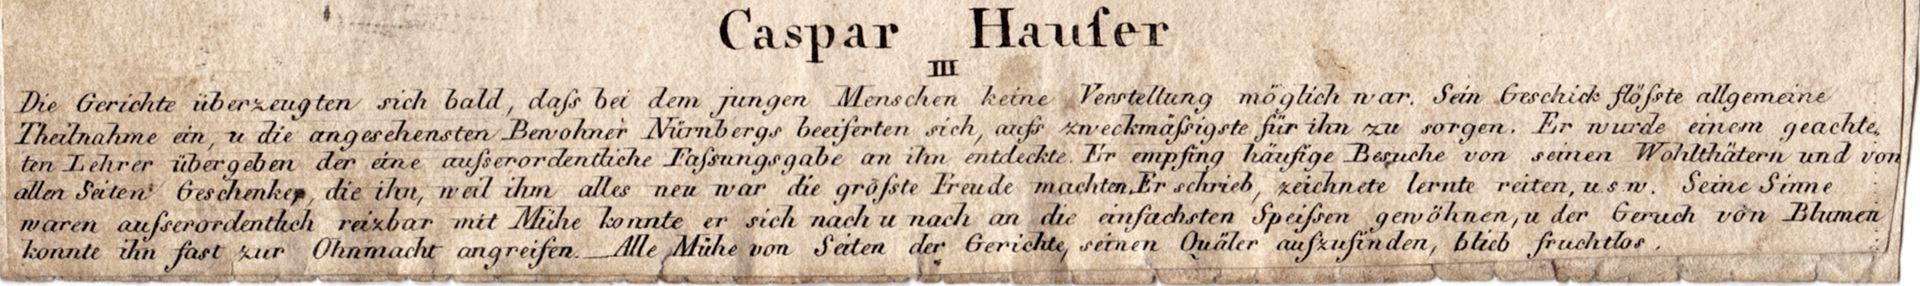 Caspar Hauser  III Bildtunterschrift